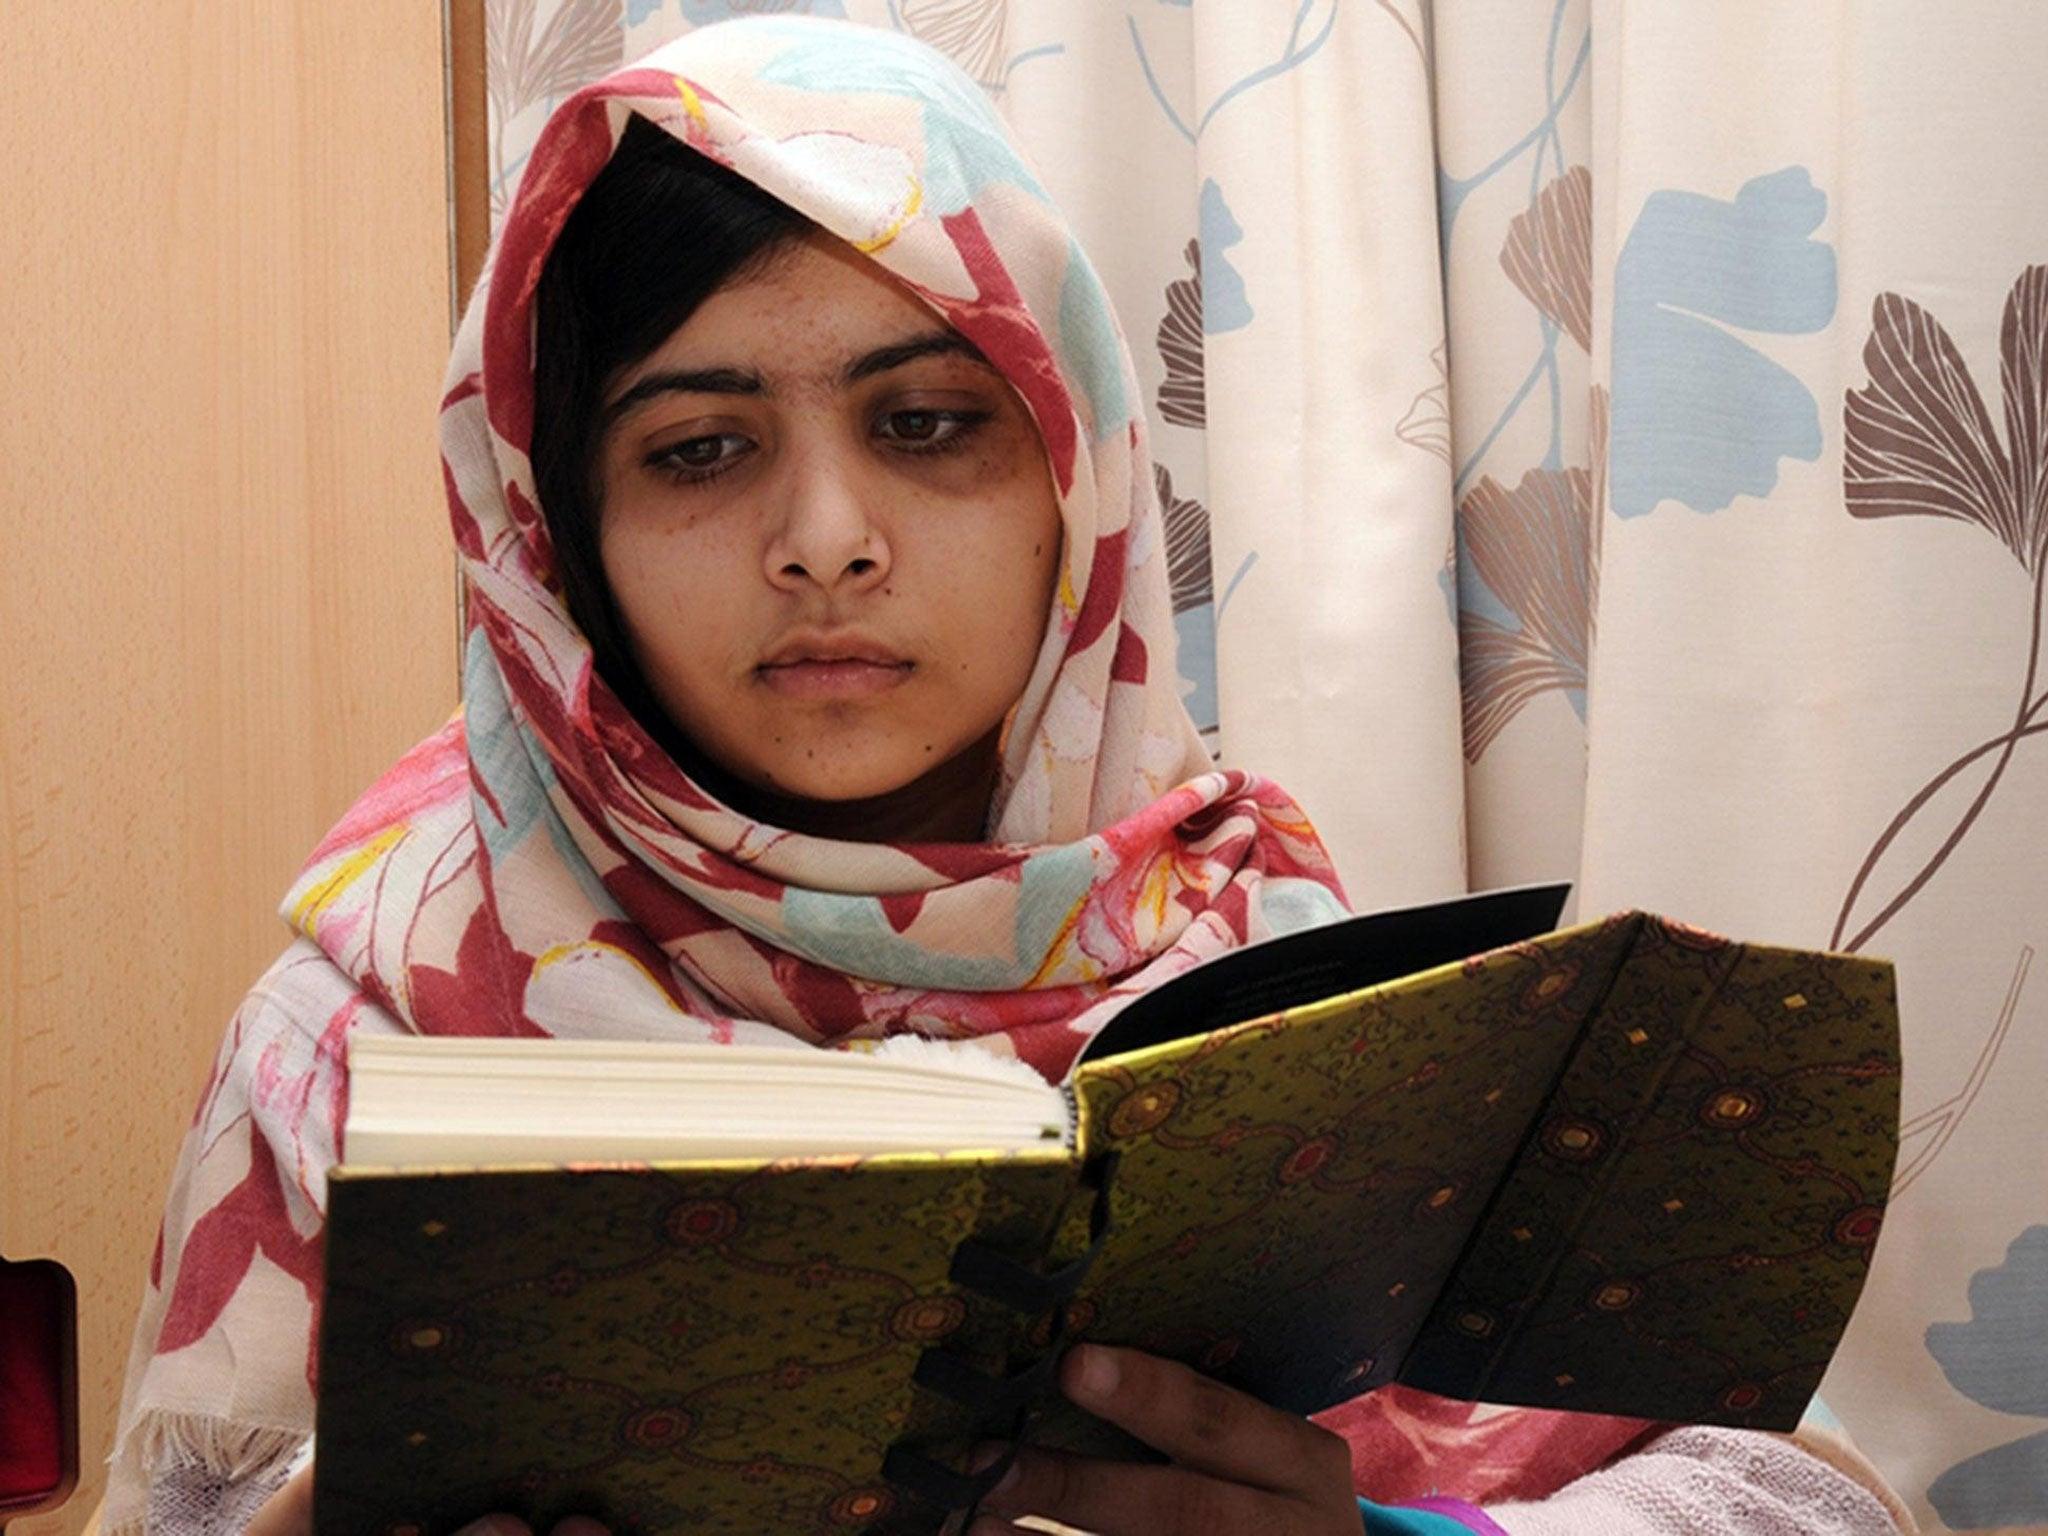 Time 100 Malala Yousafzai Barack Obama Kim Jong Un And Jay Z All